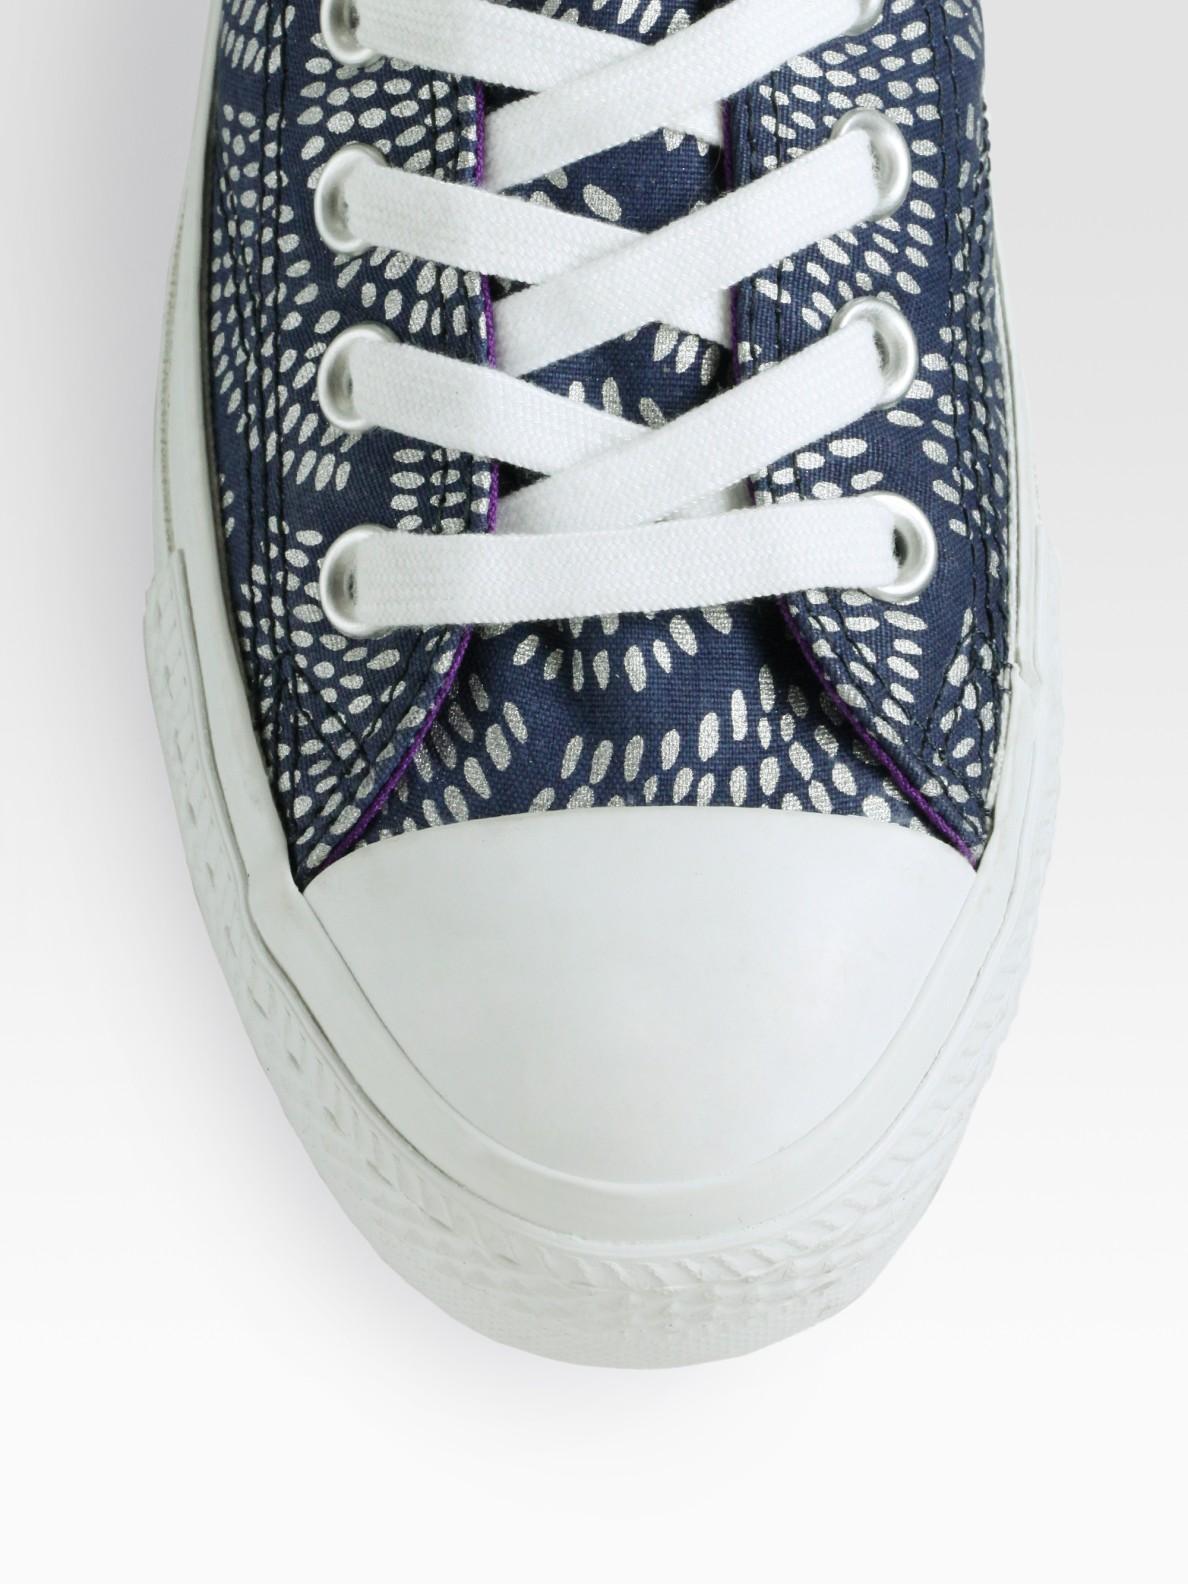 Lyst - Converse Marimekko Chuck Taylor Printed Sneakers in Blue 3fa27aa2d